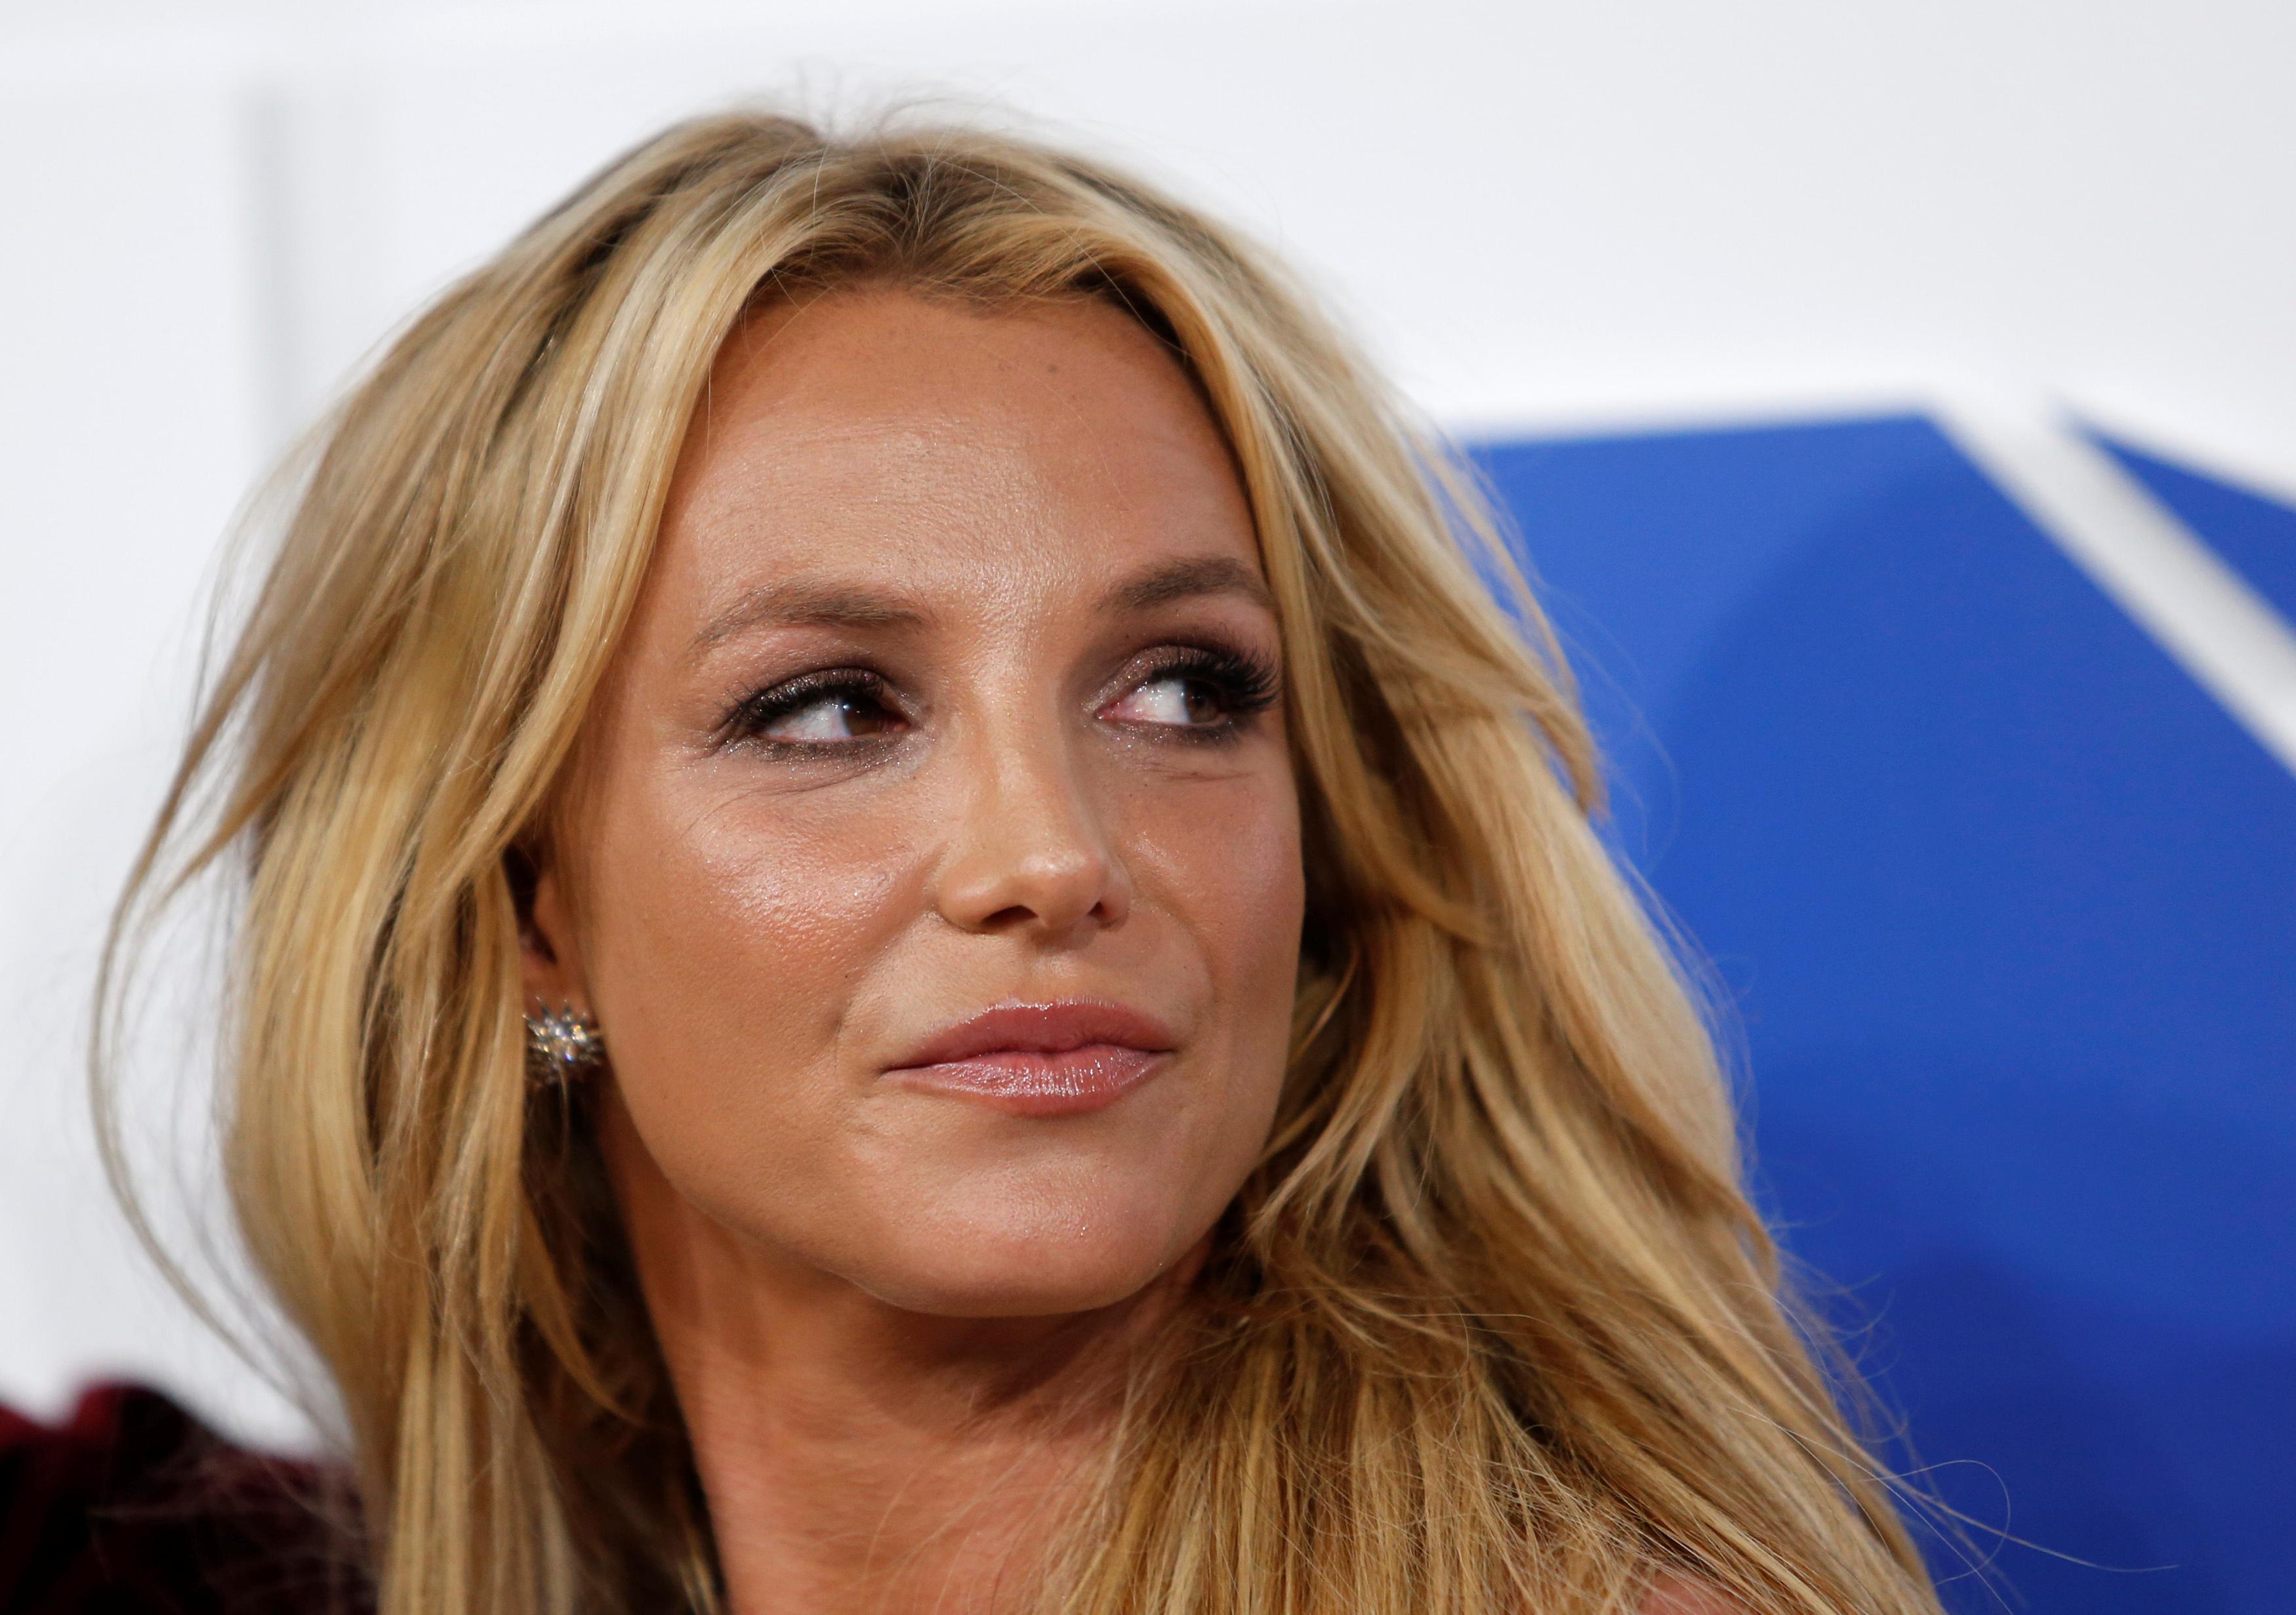 File photo: Singer Britney Spears arrives at the 2016 MTV Video Music Awards in New York, U.S.  REUTERS/Eduardo Munoz